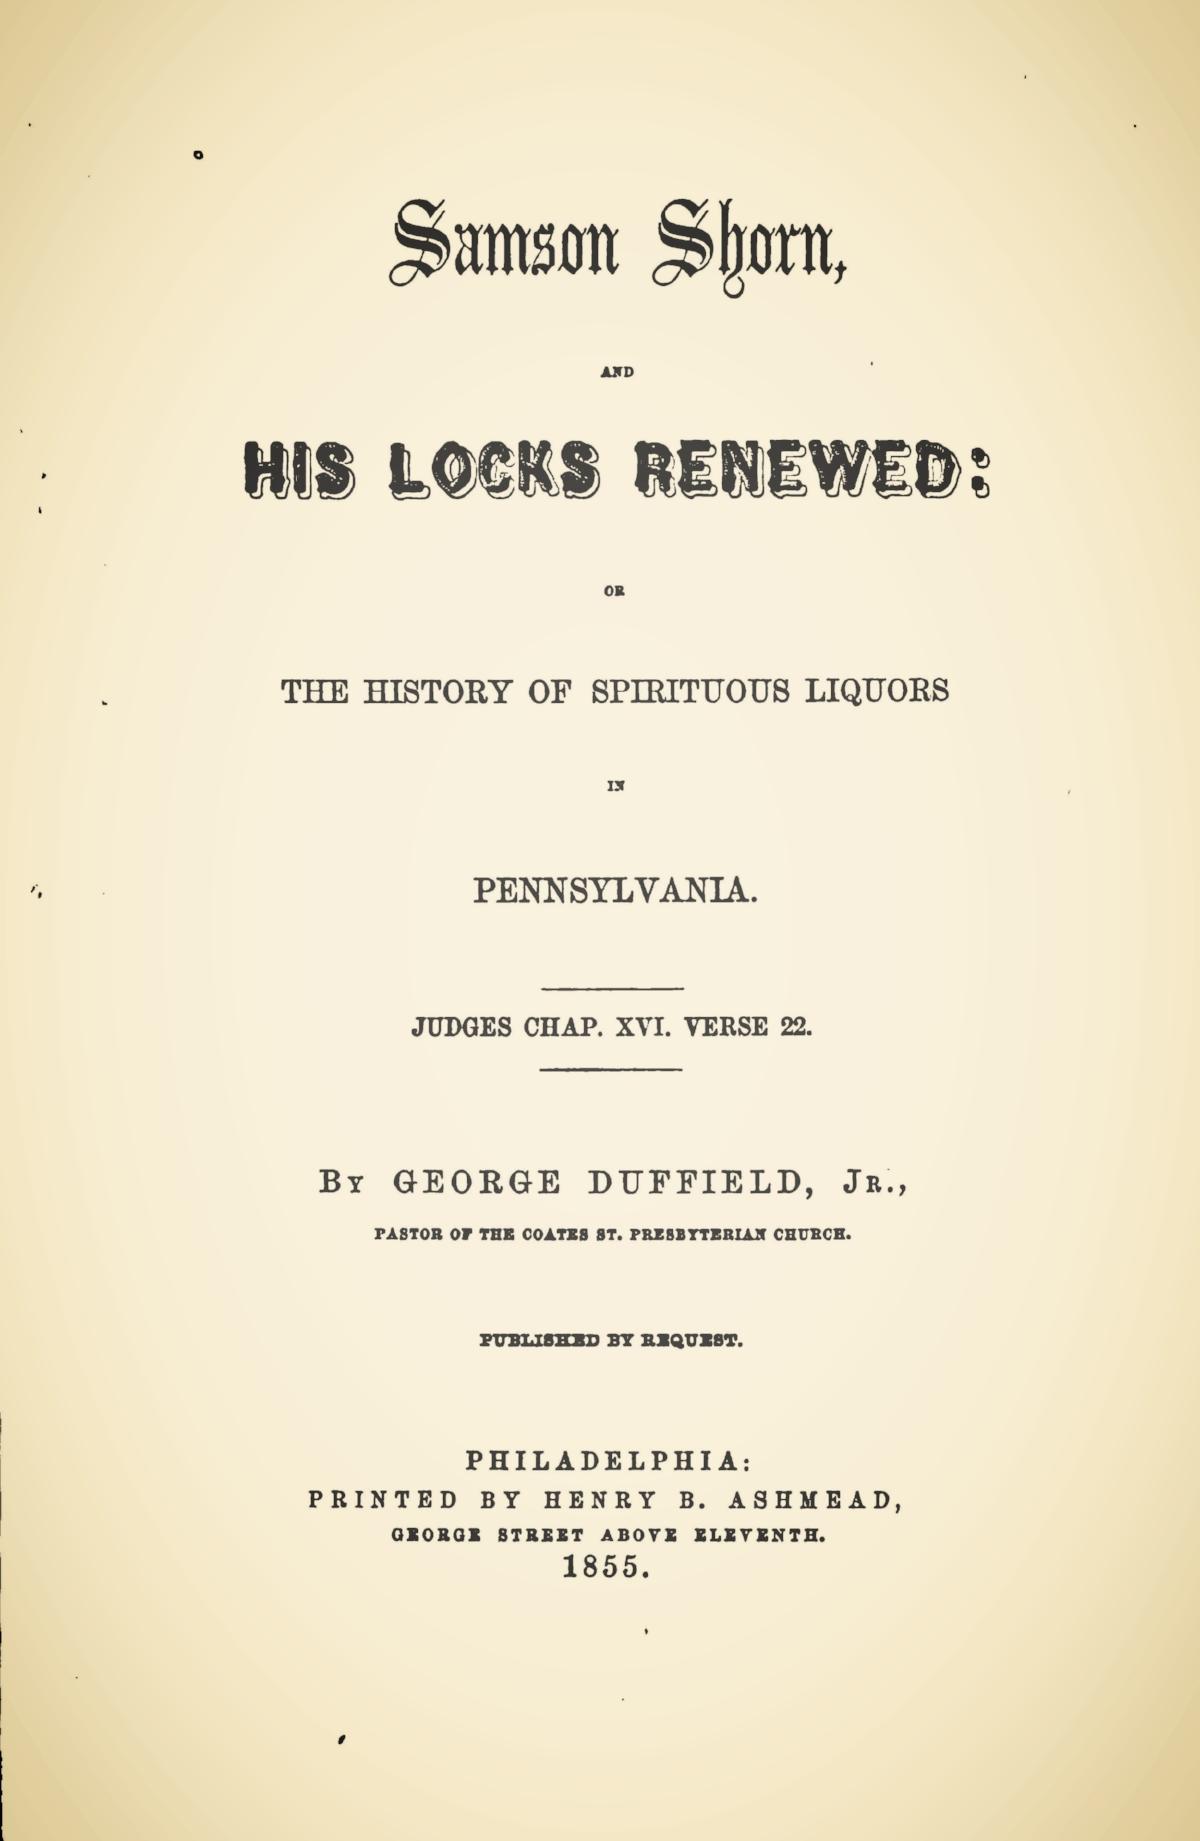 Duffield, IV, George, Samson Shorn, and His Locks Renewed Title Page.jpg